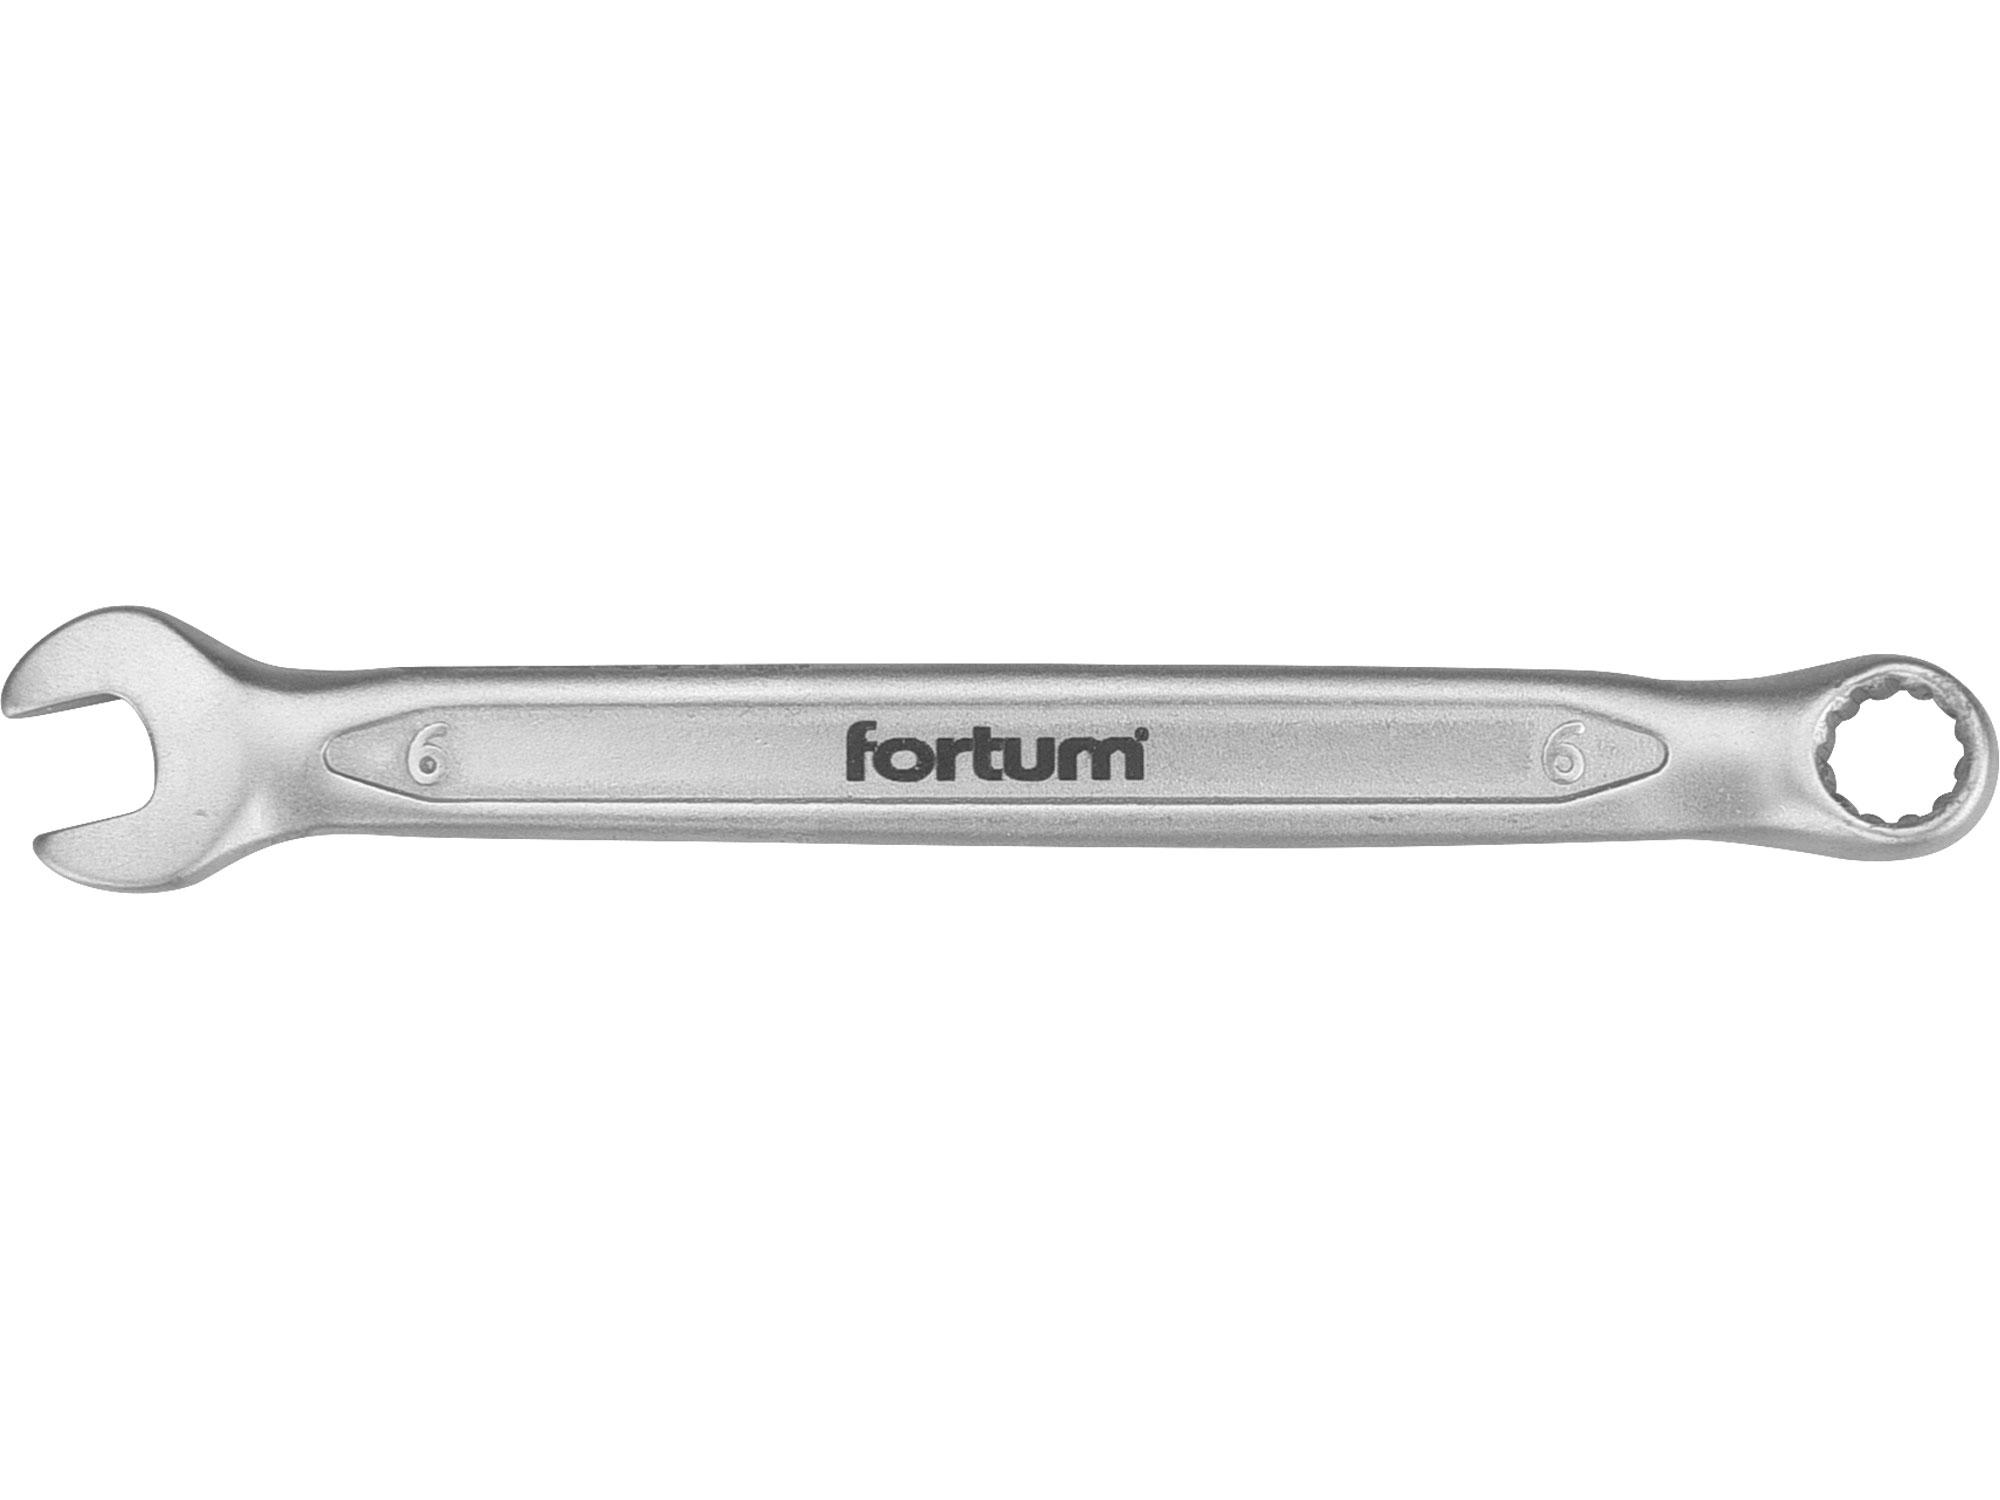 klíč očkoplochý, 6mm, L 110mm, FORTUM 4730206